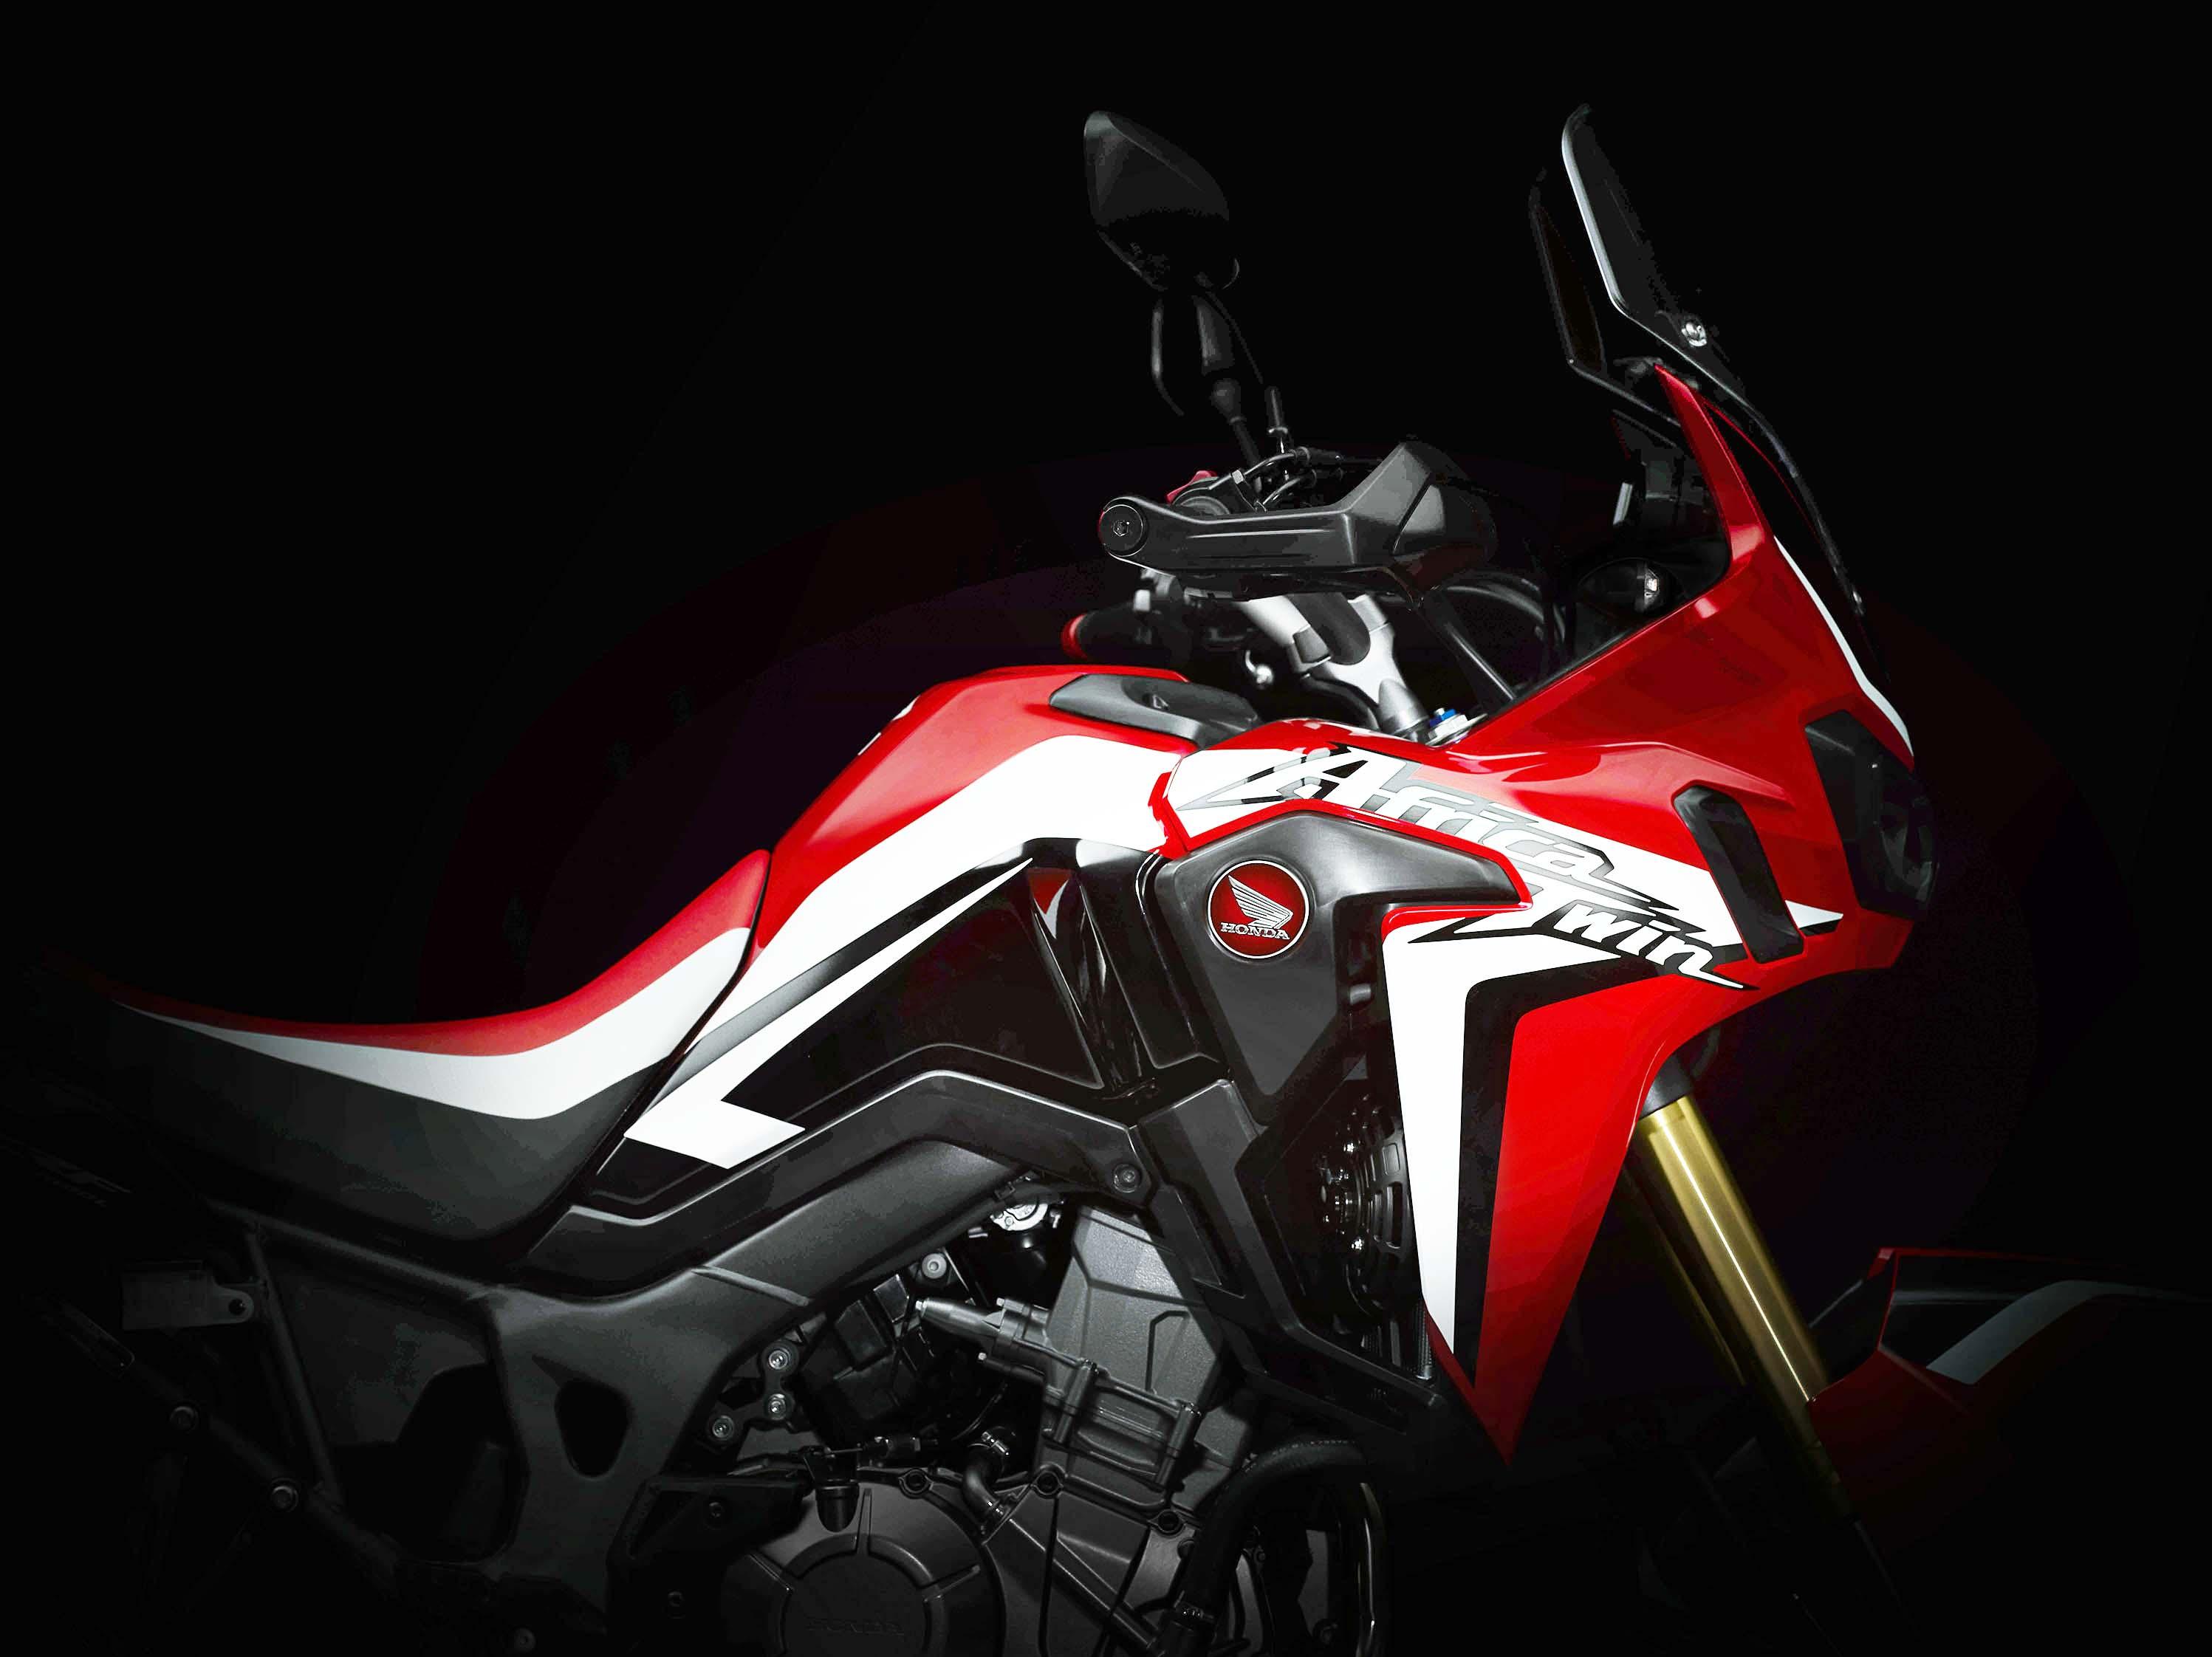 Honda-CRF1000L-Africa-Twin-Enhanced-05